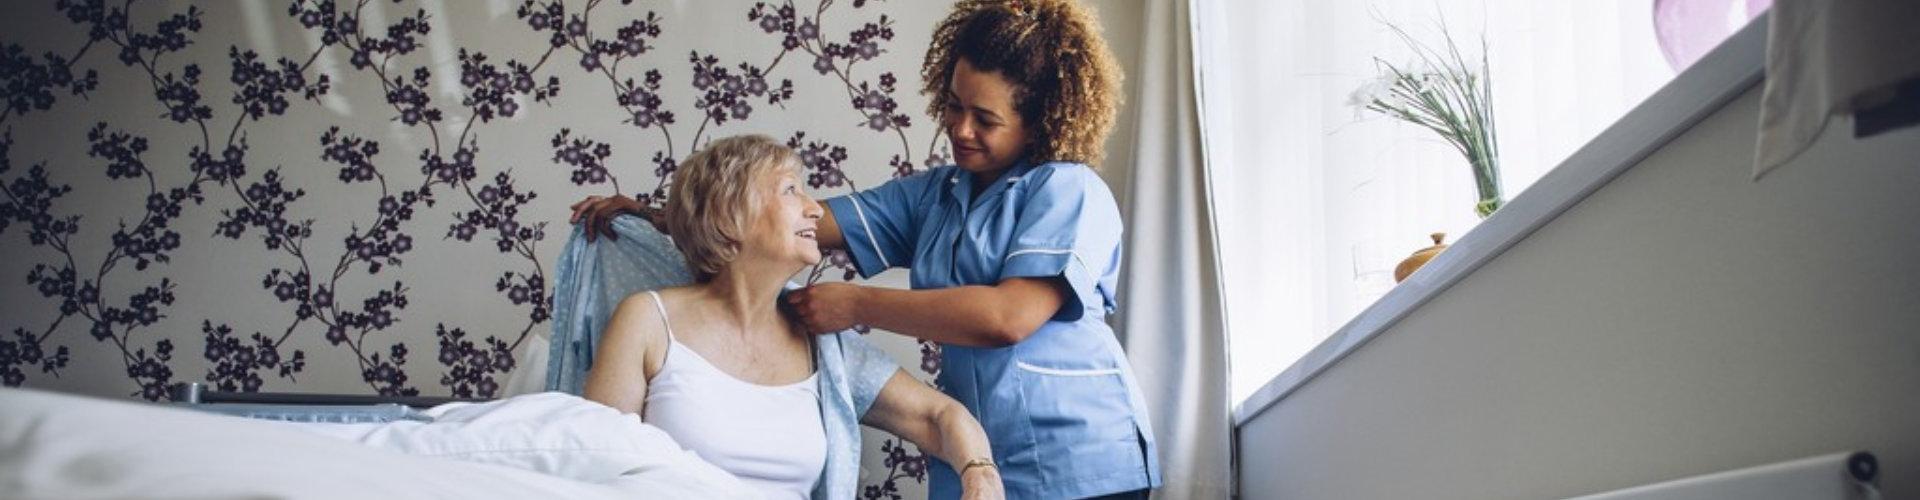 staff assisting elderly woman